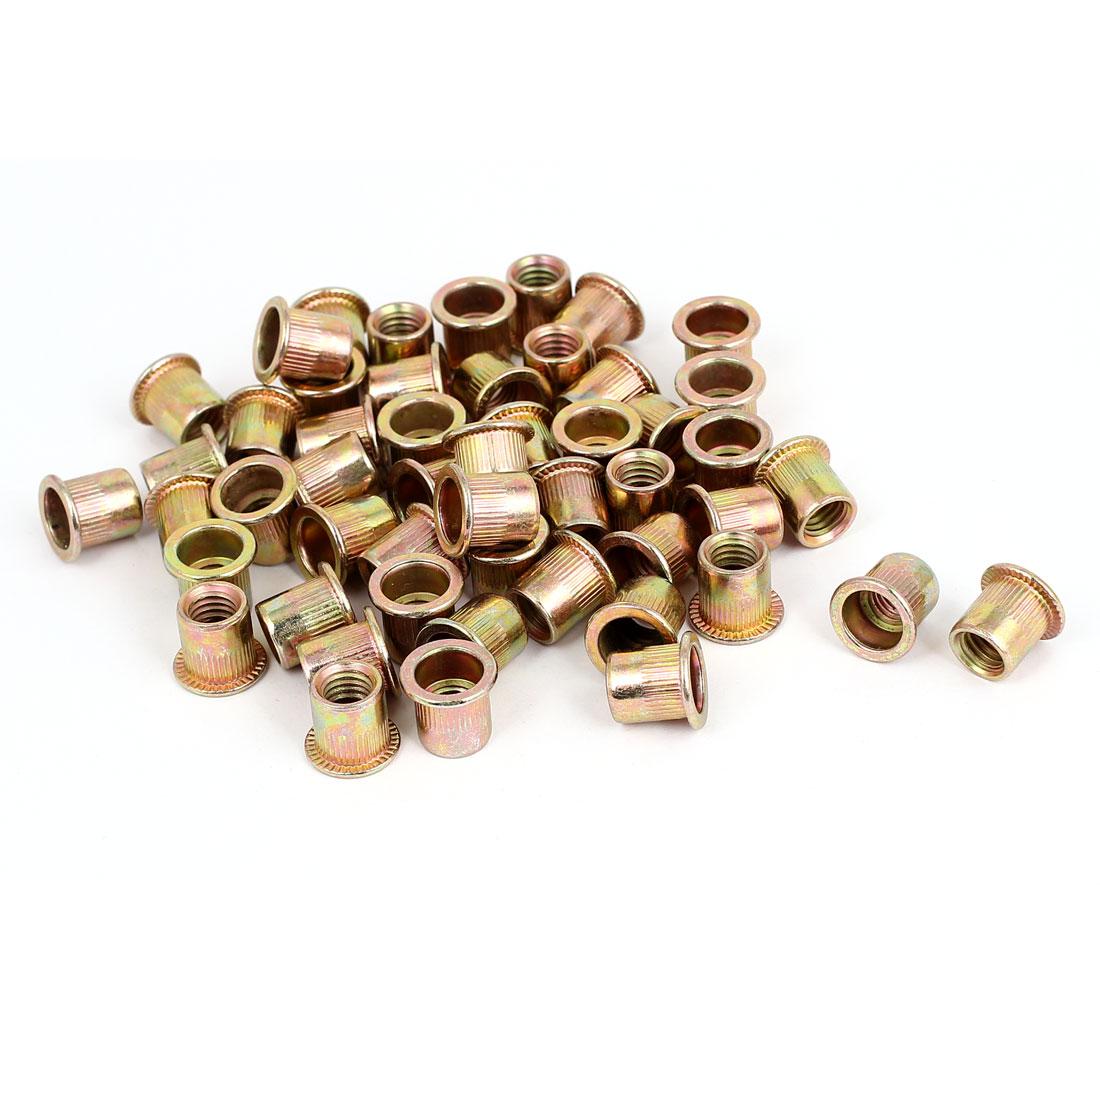 50 Pcs 14mm Flange Carbon Steel Blind Rivet Nut Insert Nutsert M8x12.5mm